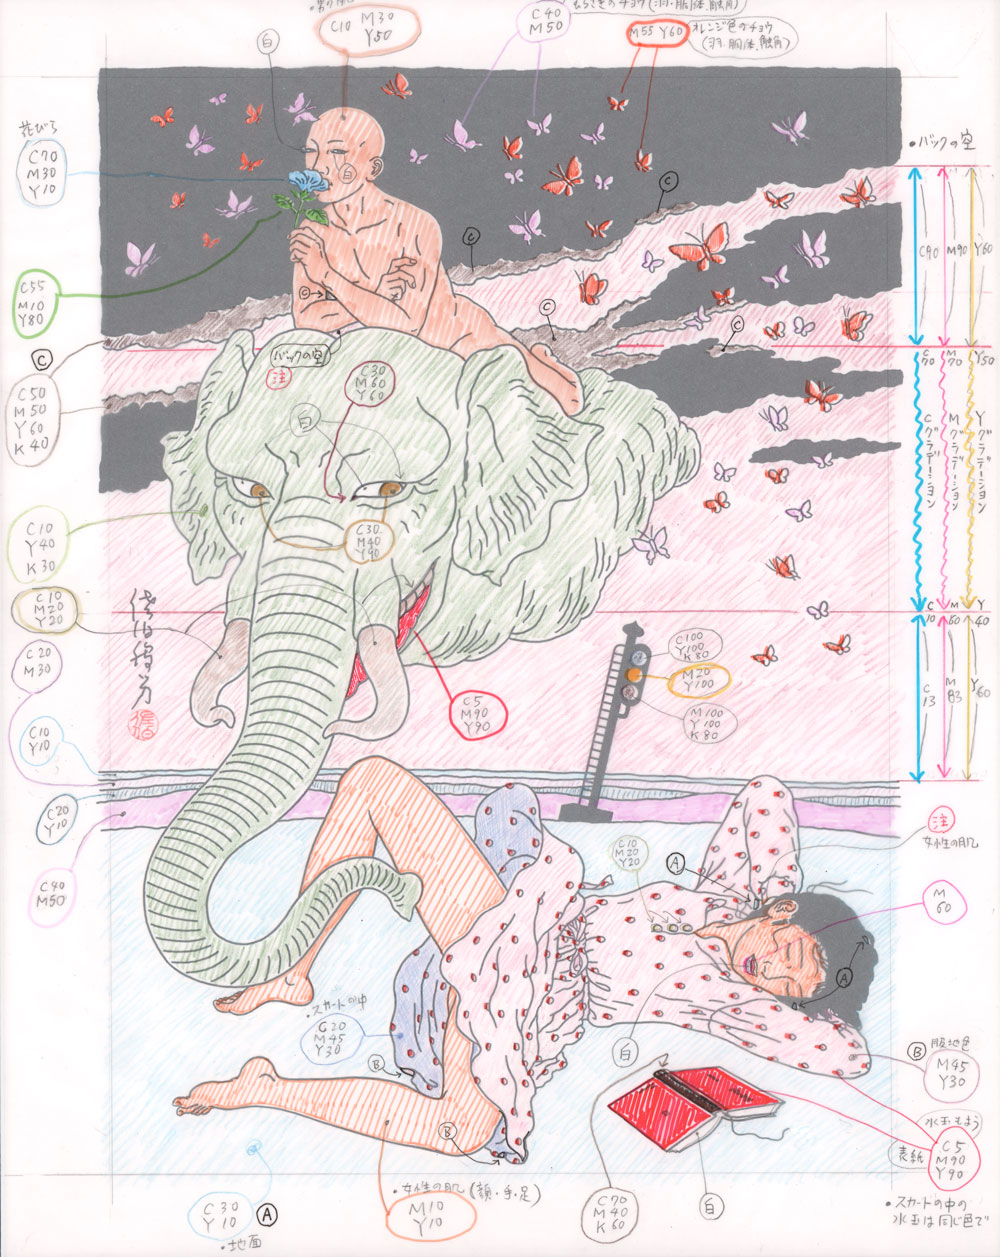 Toshio SaekiMadoromi, 2015Ink on vellum.15 x 19.5 in. unframed